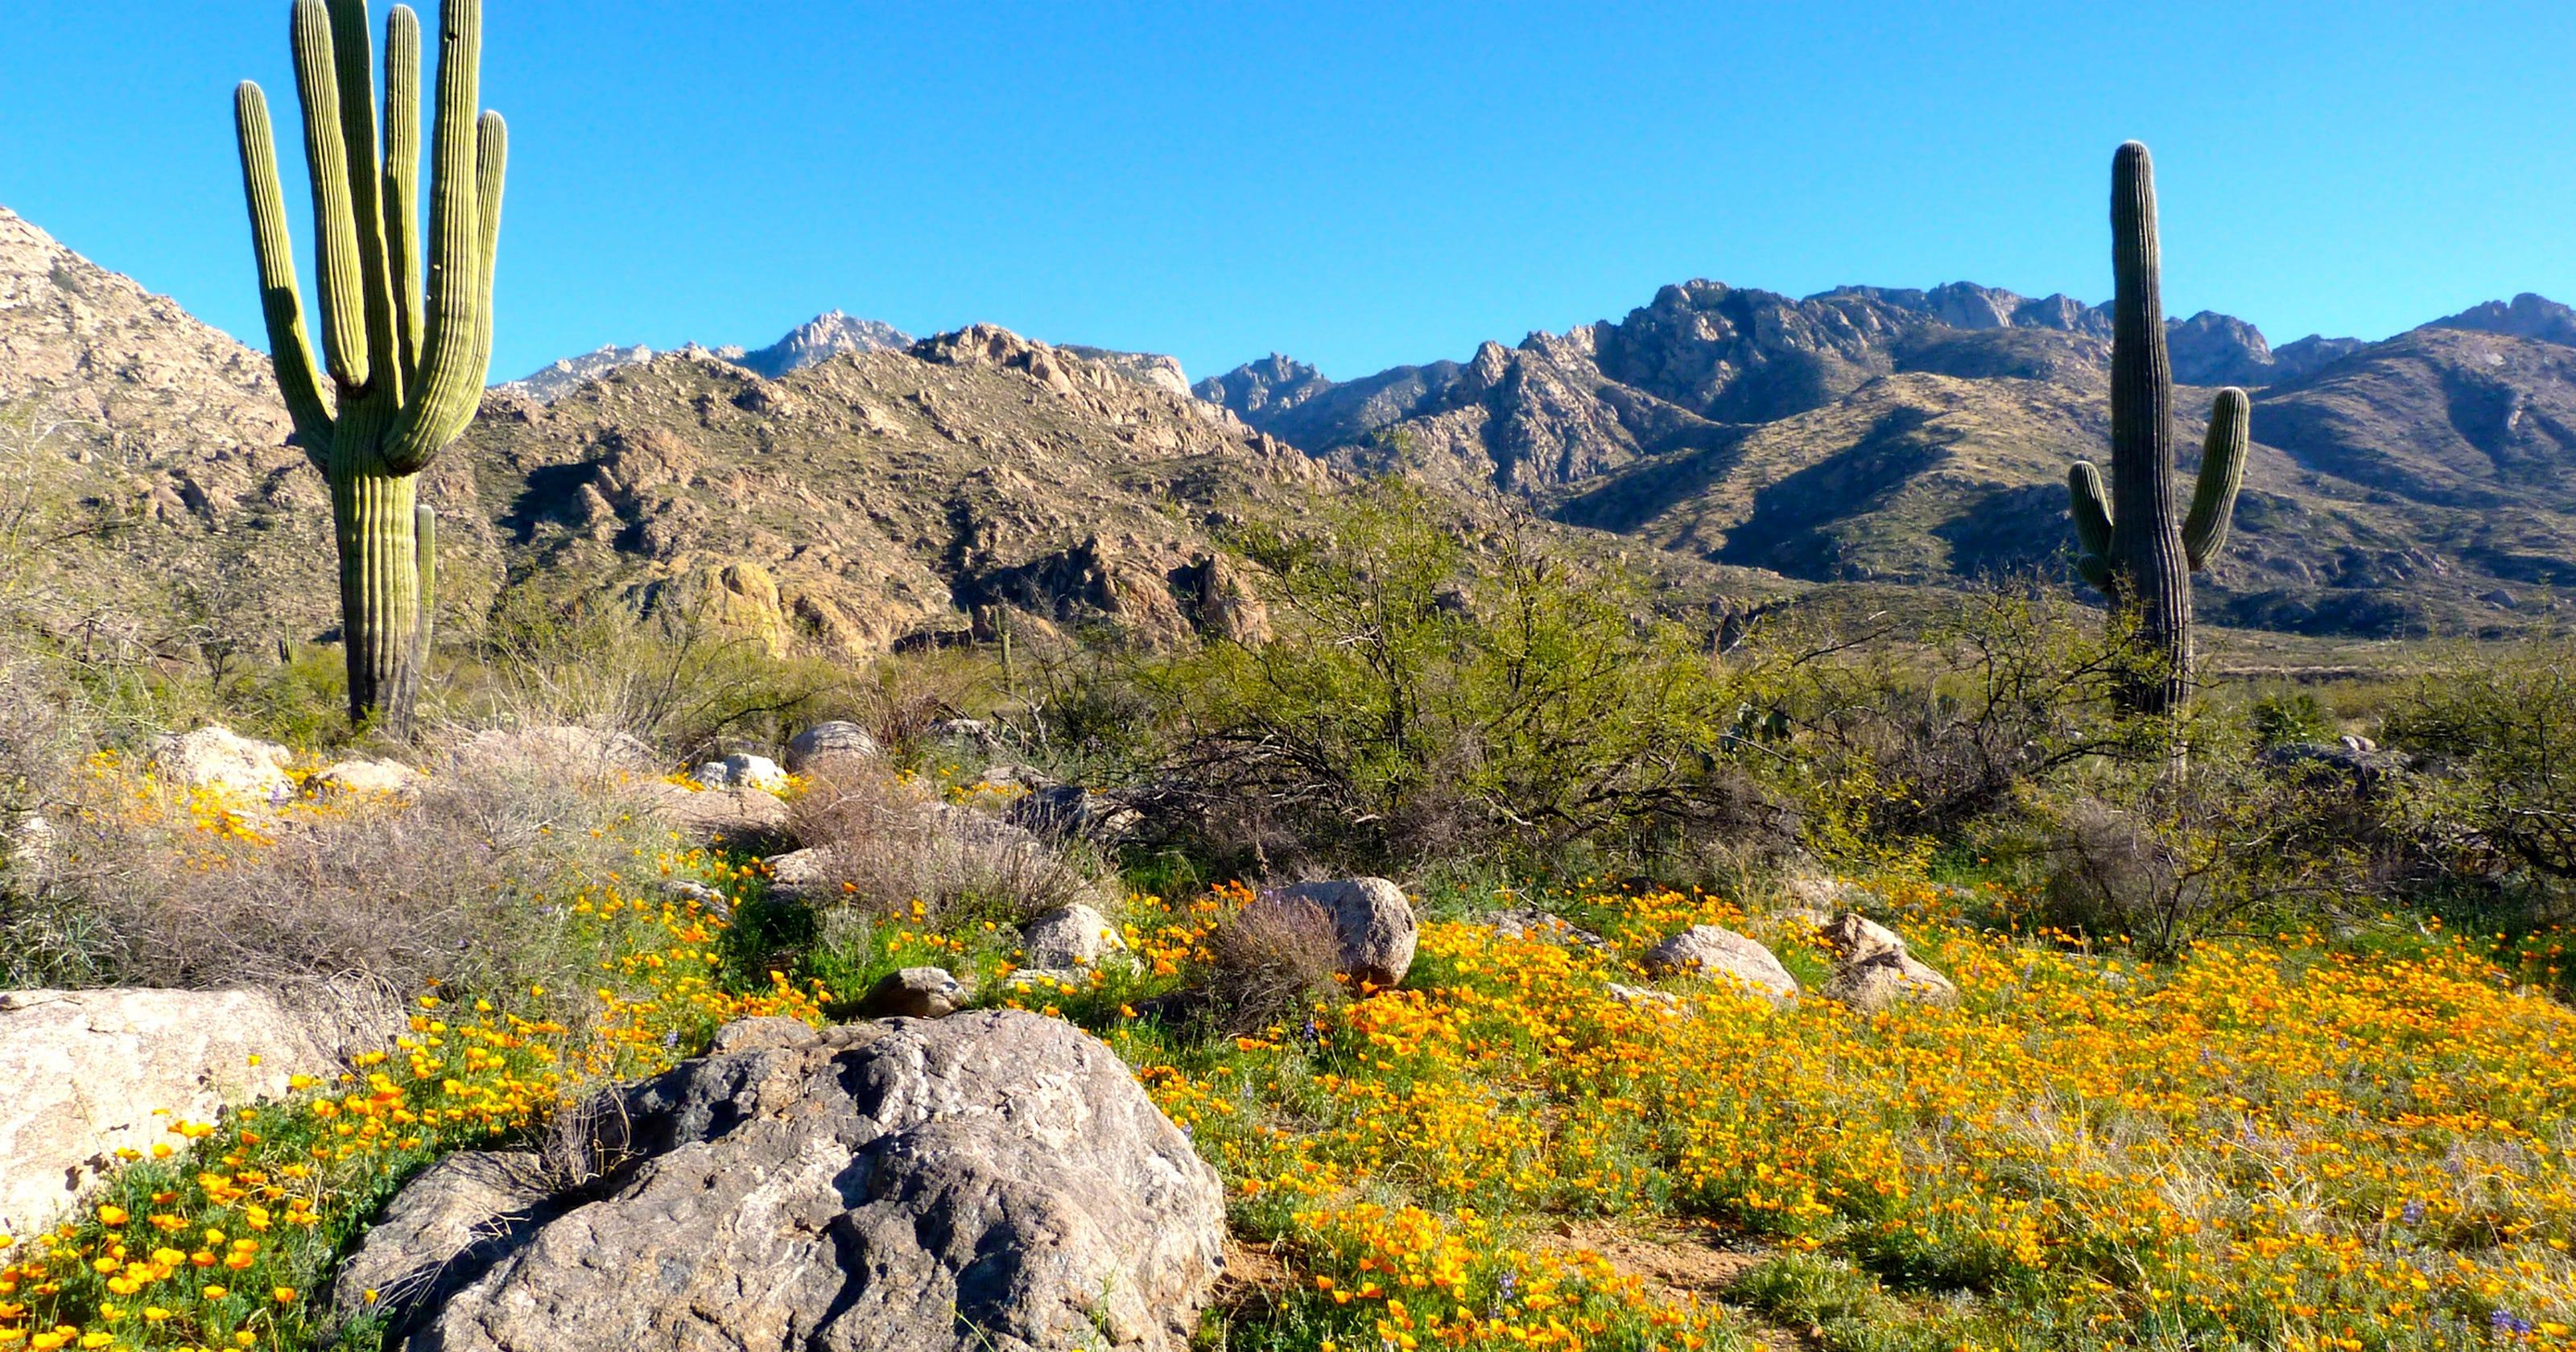 Best Places To See Arizonas Wildflowers